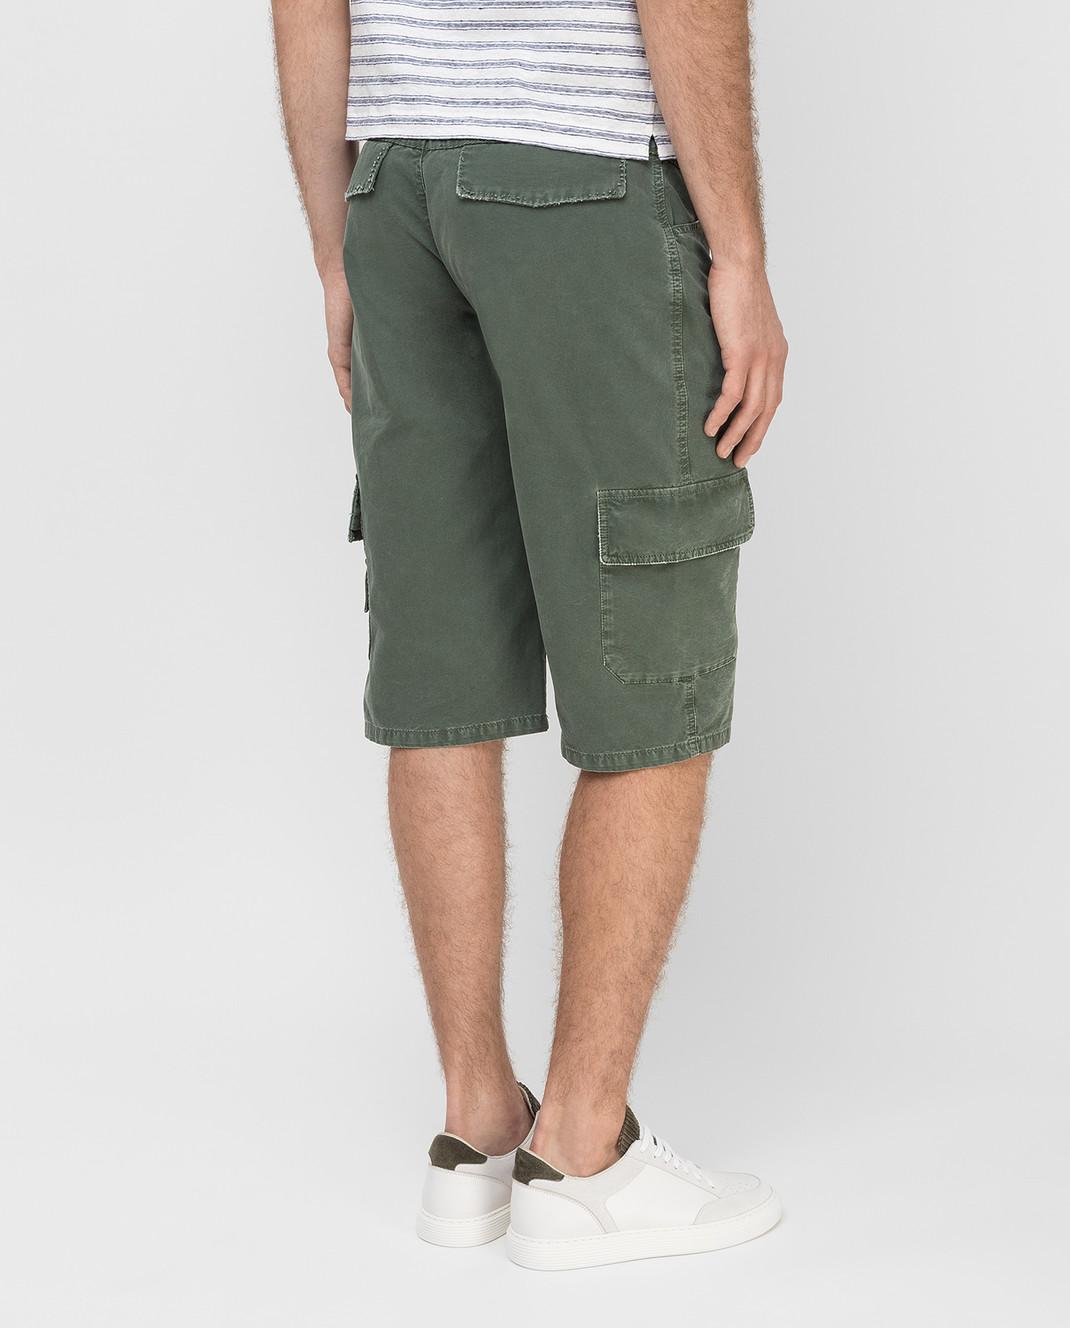 Ermanno Scervino Зеленые шорты U287P702AXC изображение 4